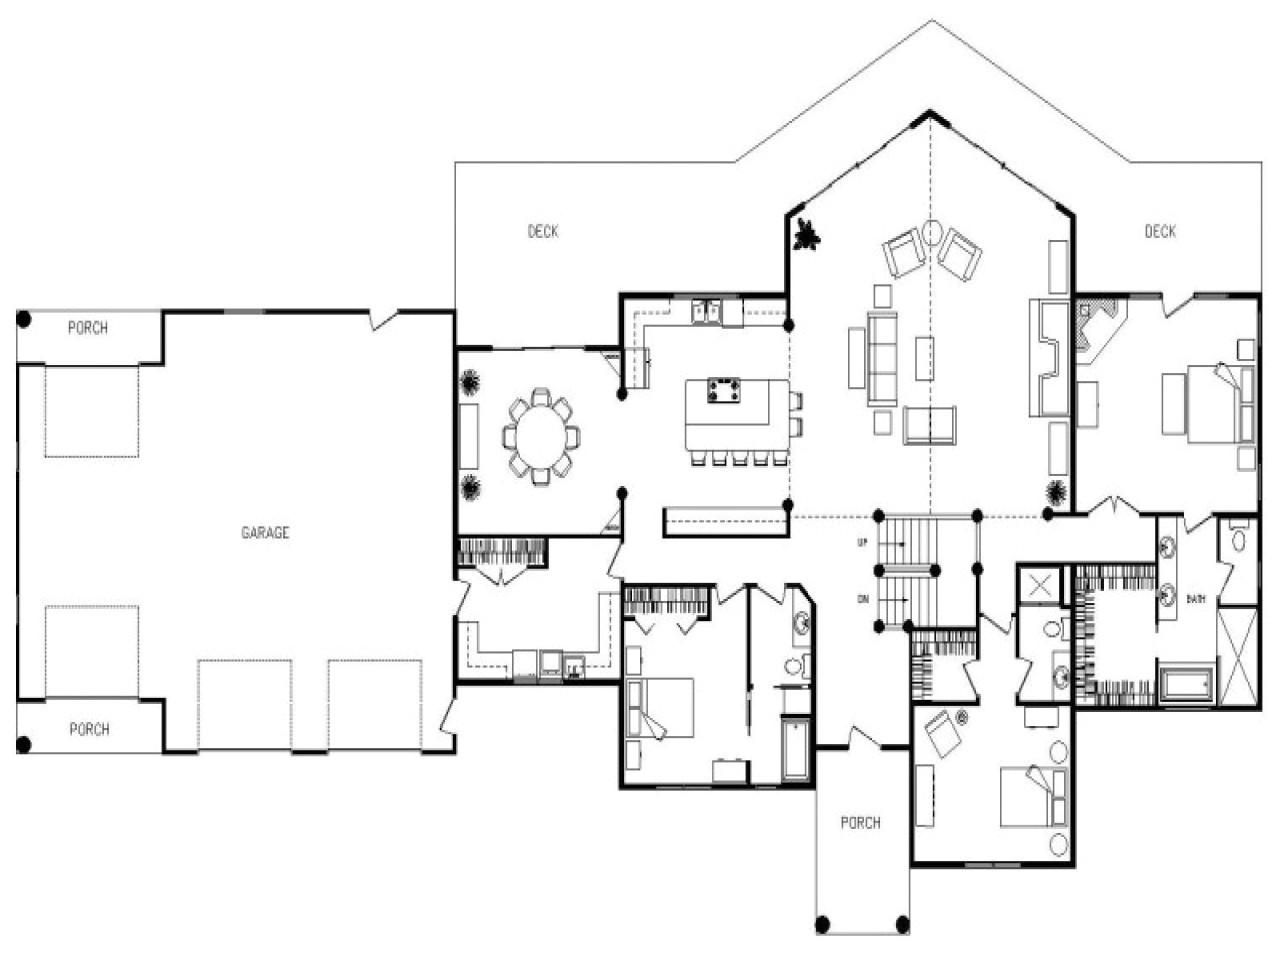 d61ab3cfb0b25424 open floor plan design ideas unique open floor plan homes